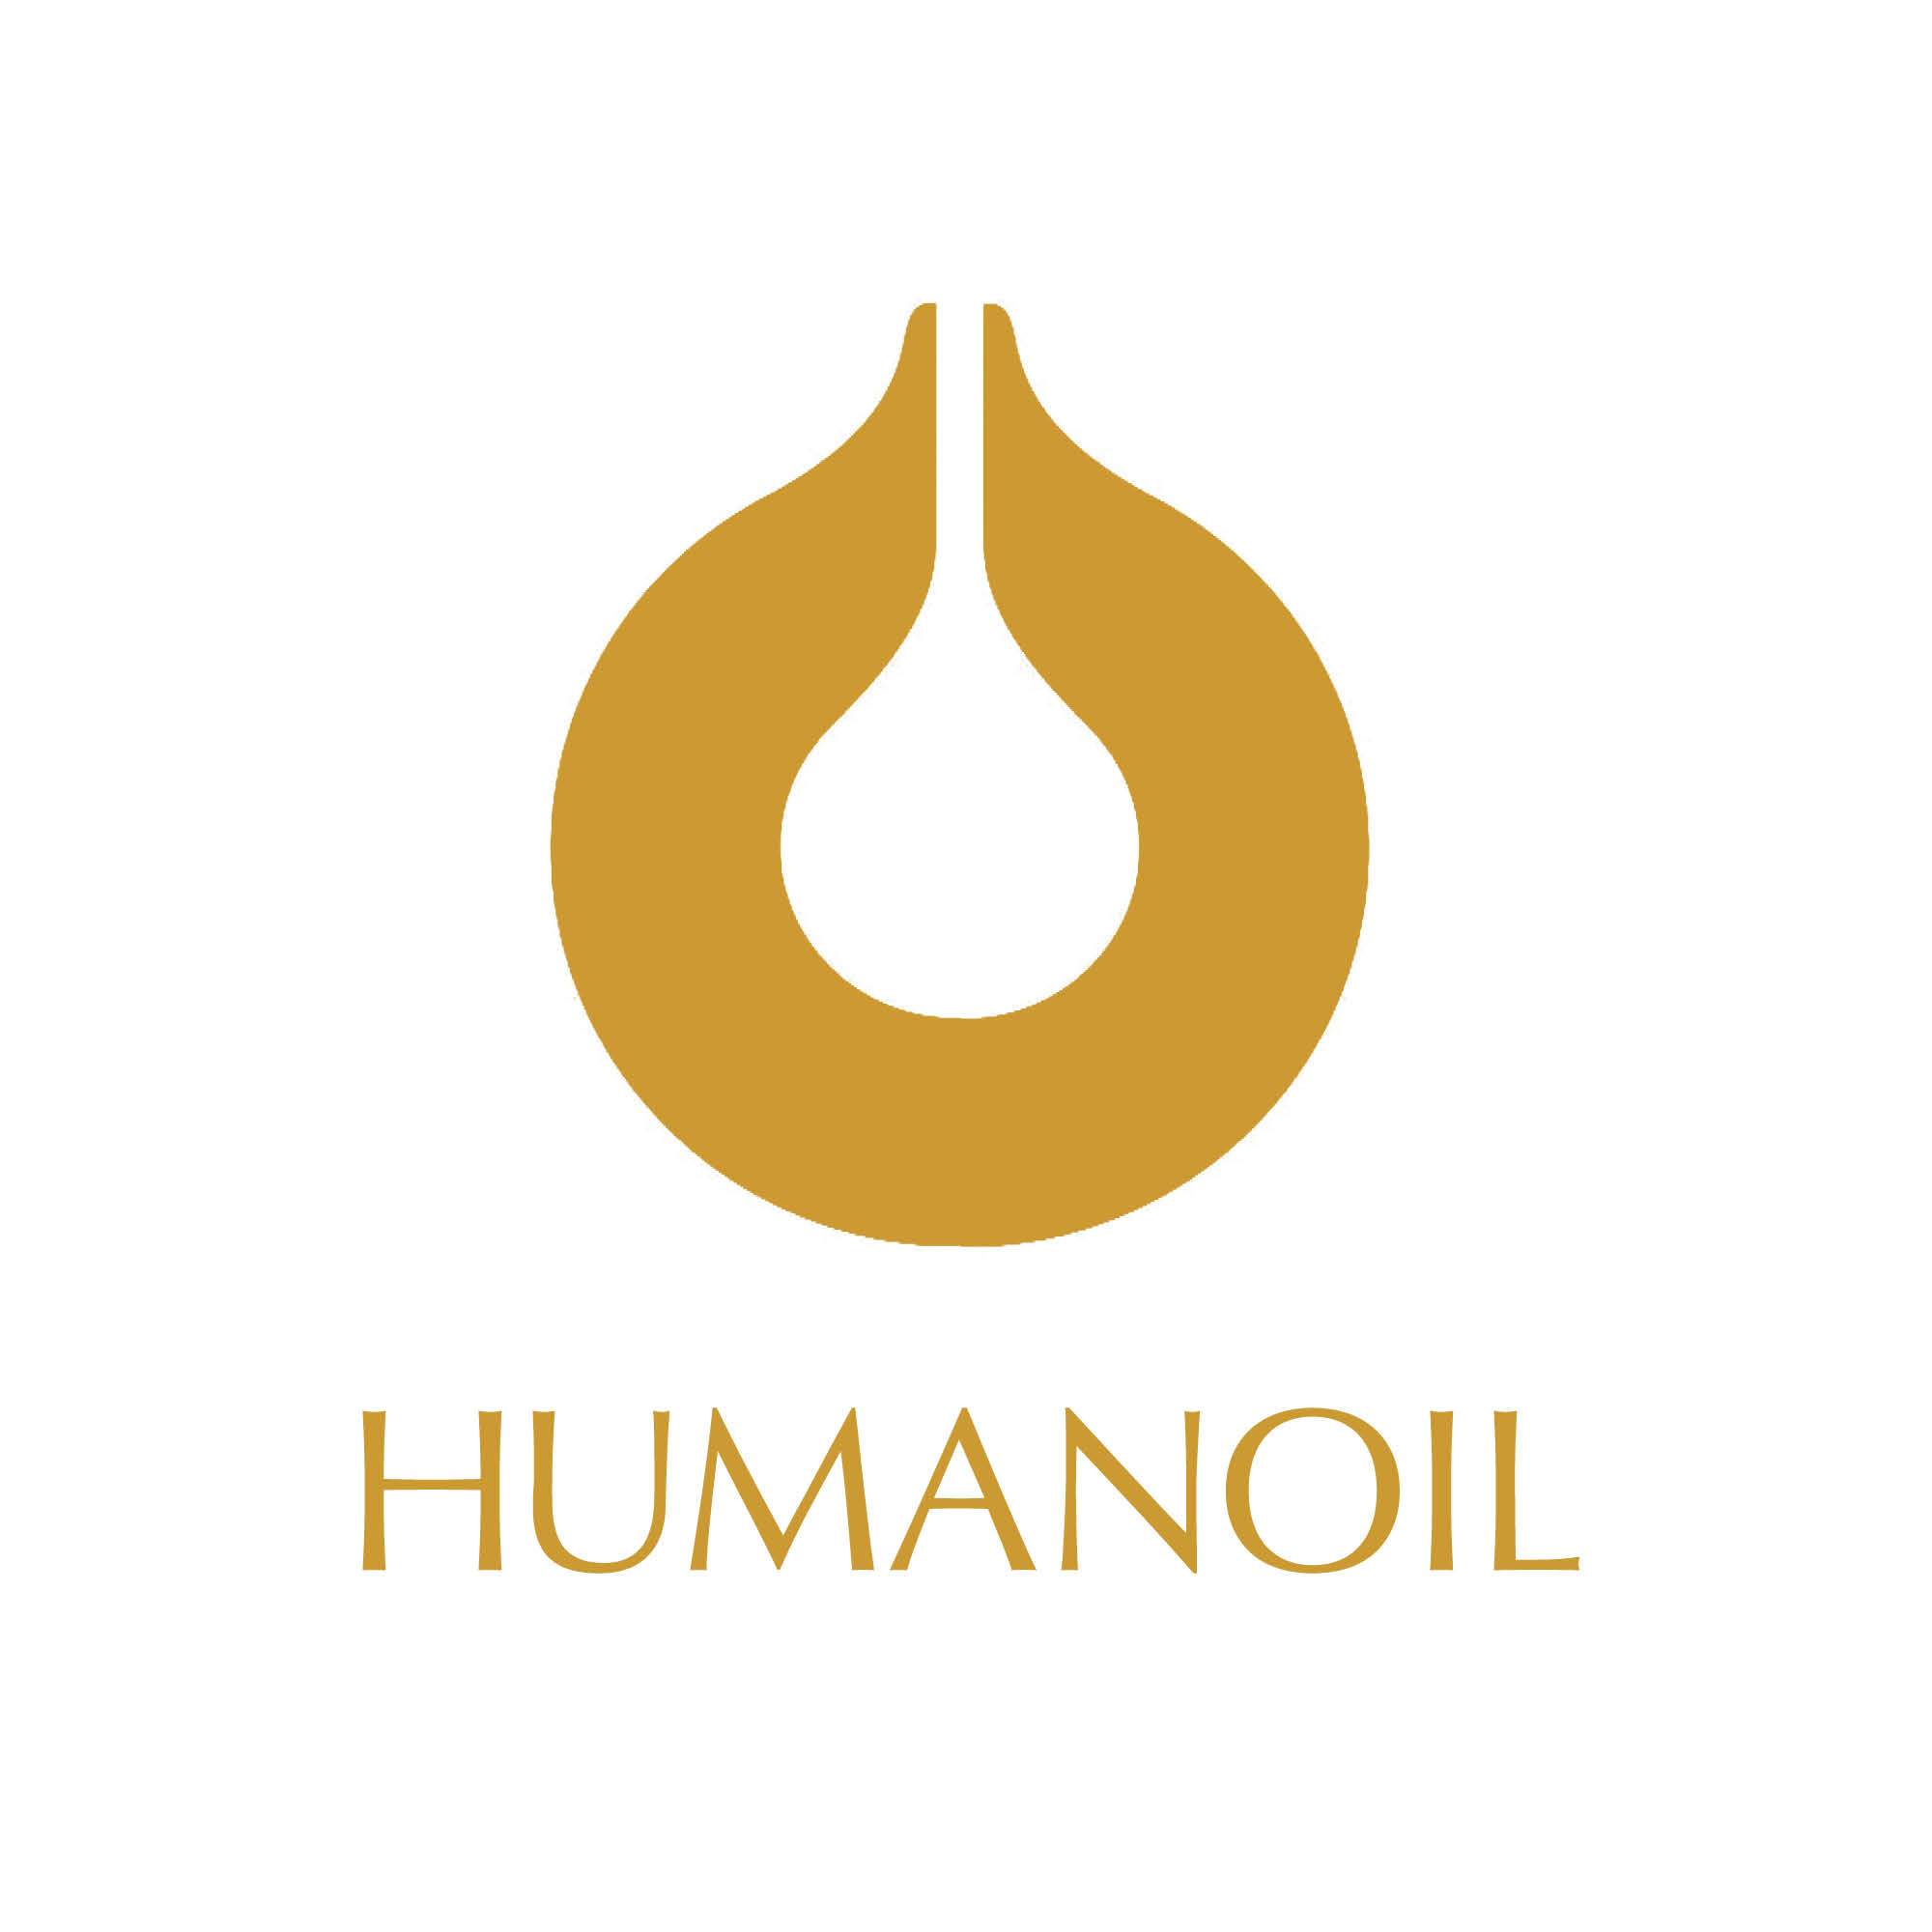 humanoil